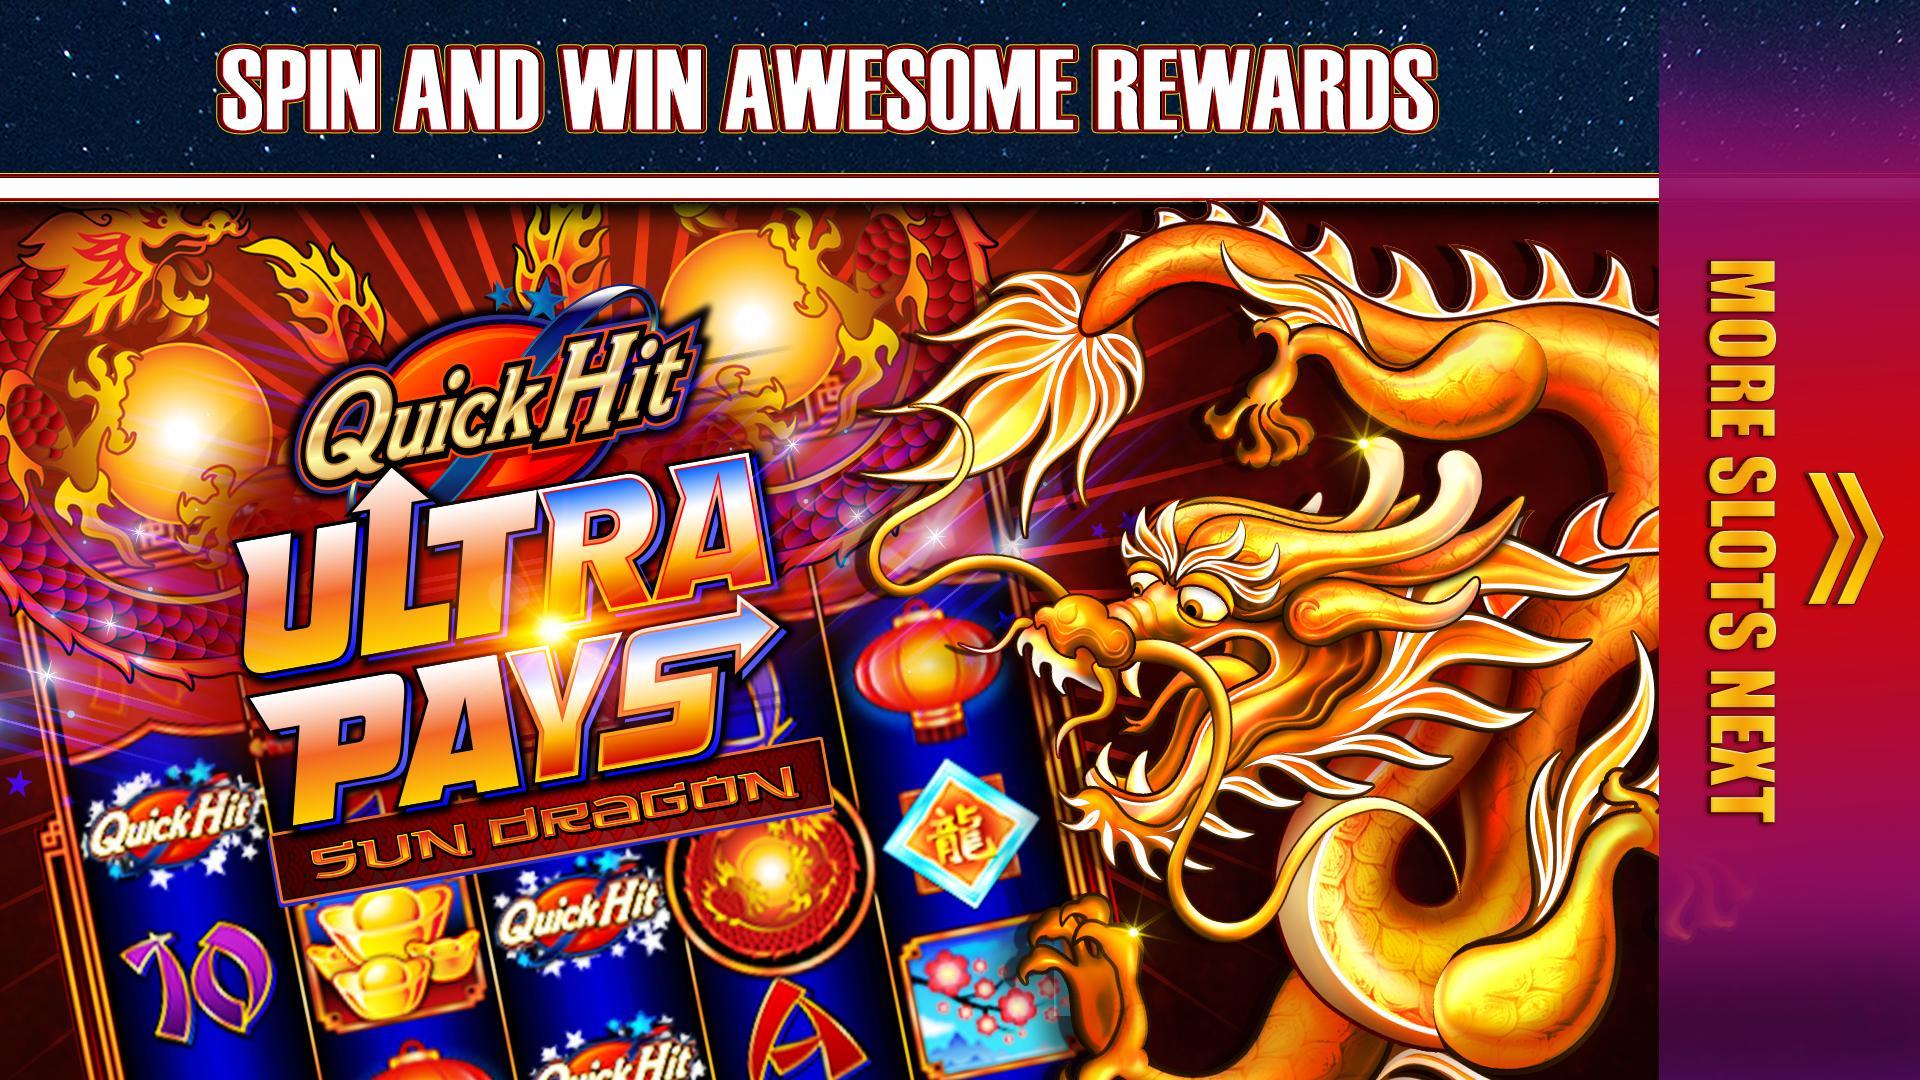 Quick Hit Casino Games - Free Casino Slots Games 2.5.17 Screenshot 2